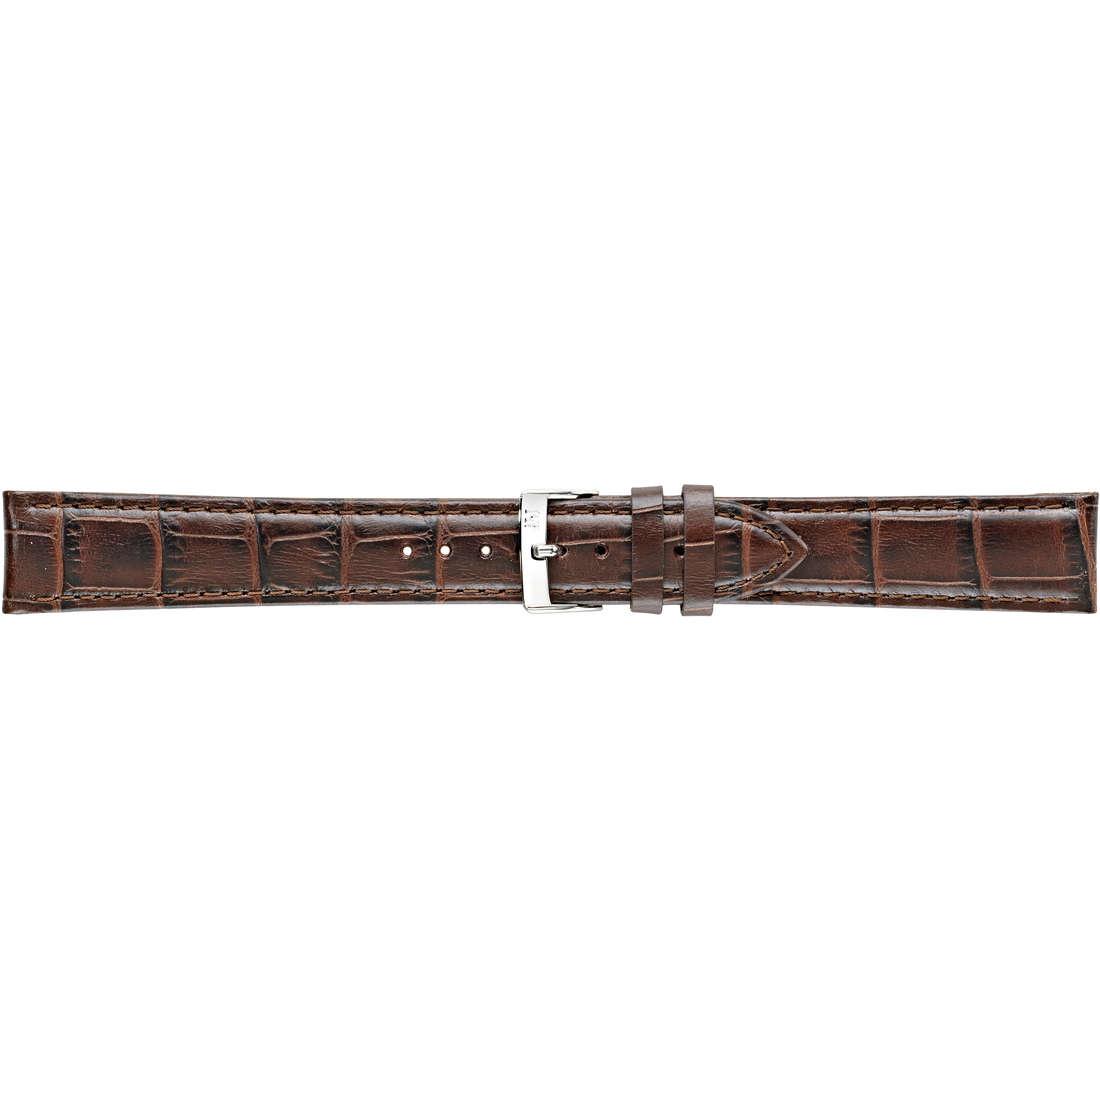 montre bande de montres unisex Morellato I Lunghi A01Y2269480032CR22